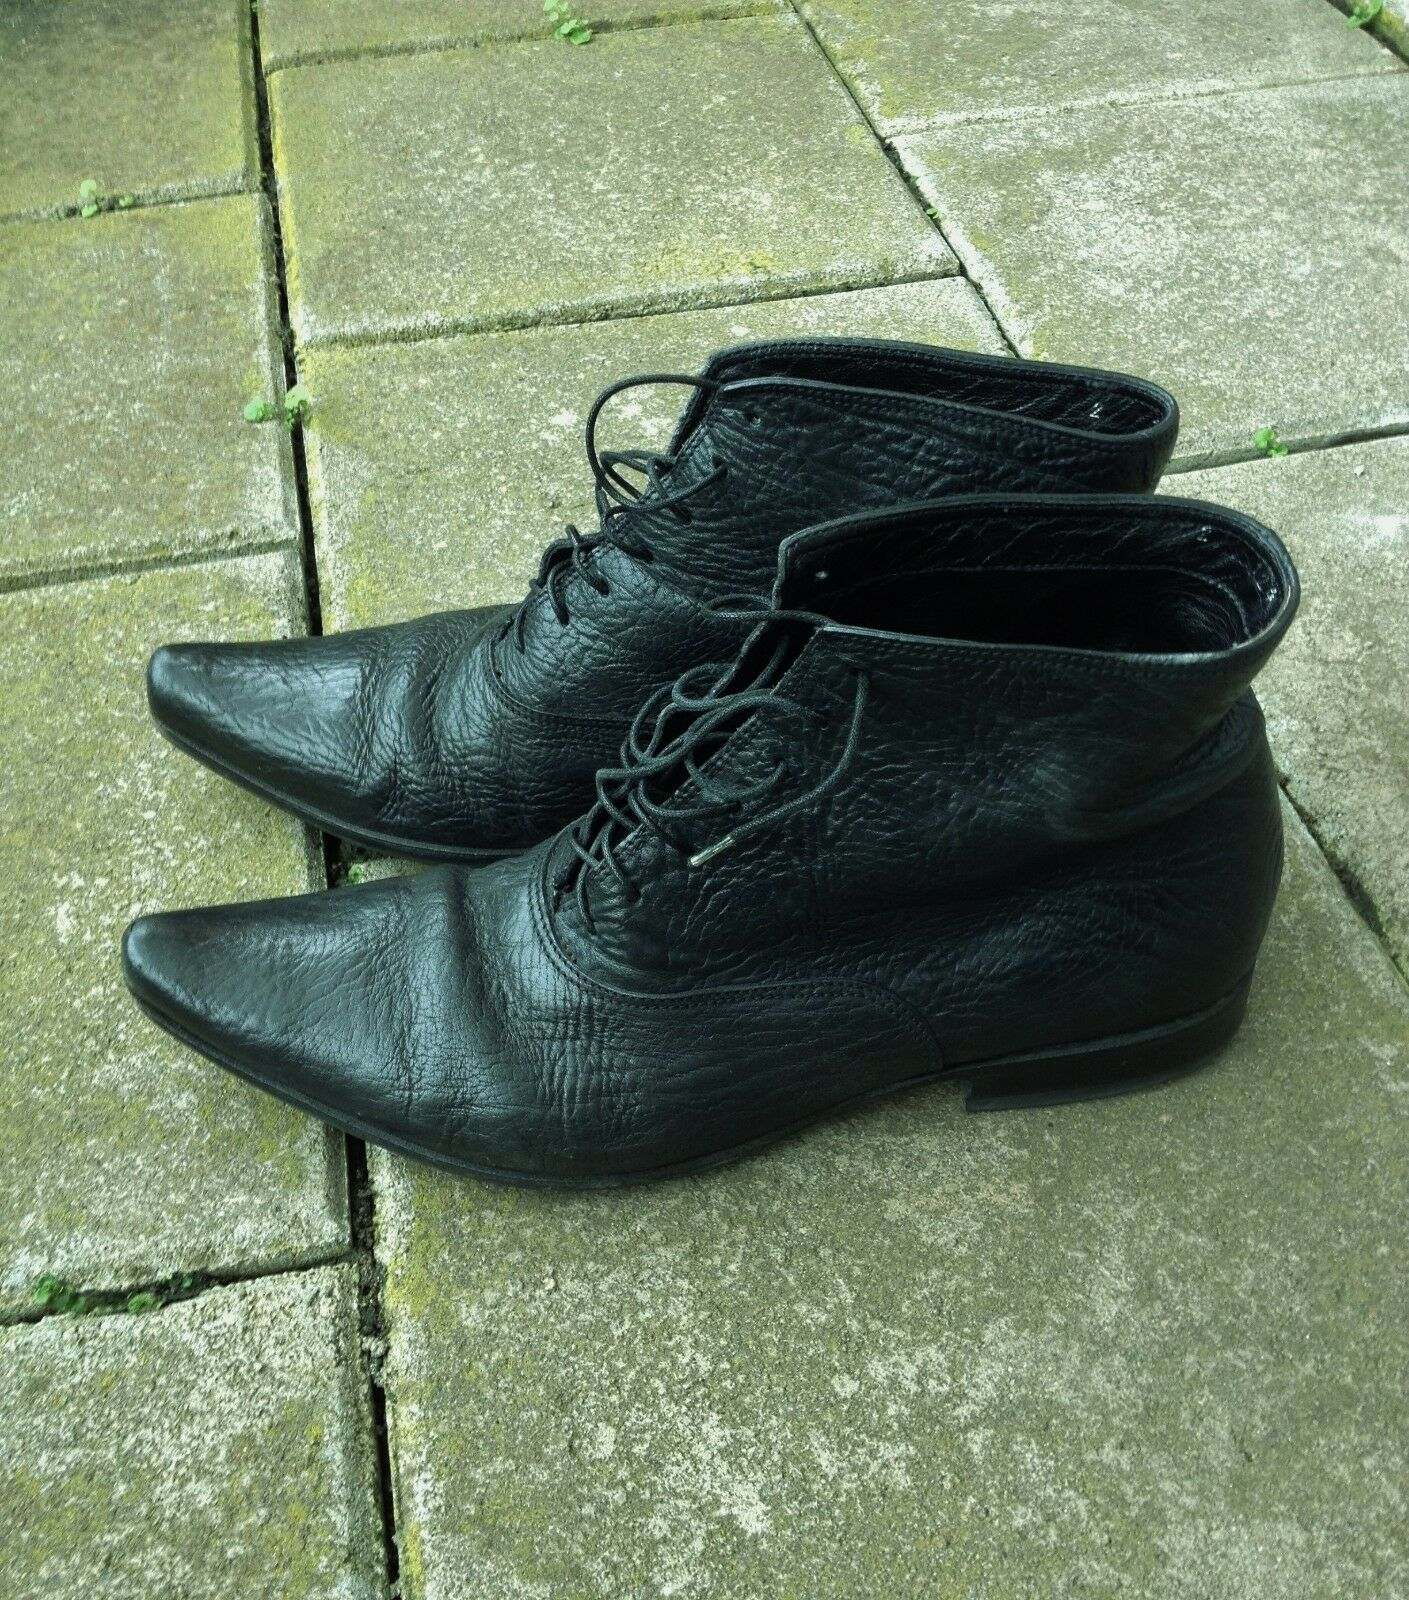 GIANNI BARBATO Black Leather Ankle Boots M - EU 40 (US 7)